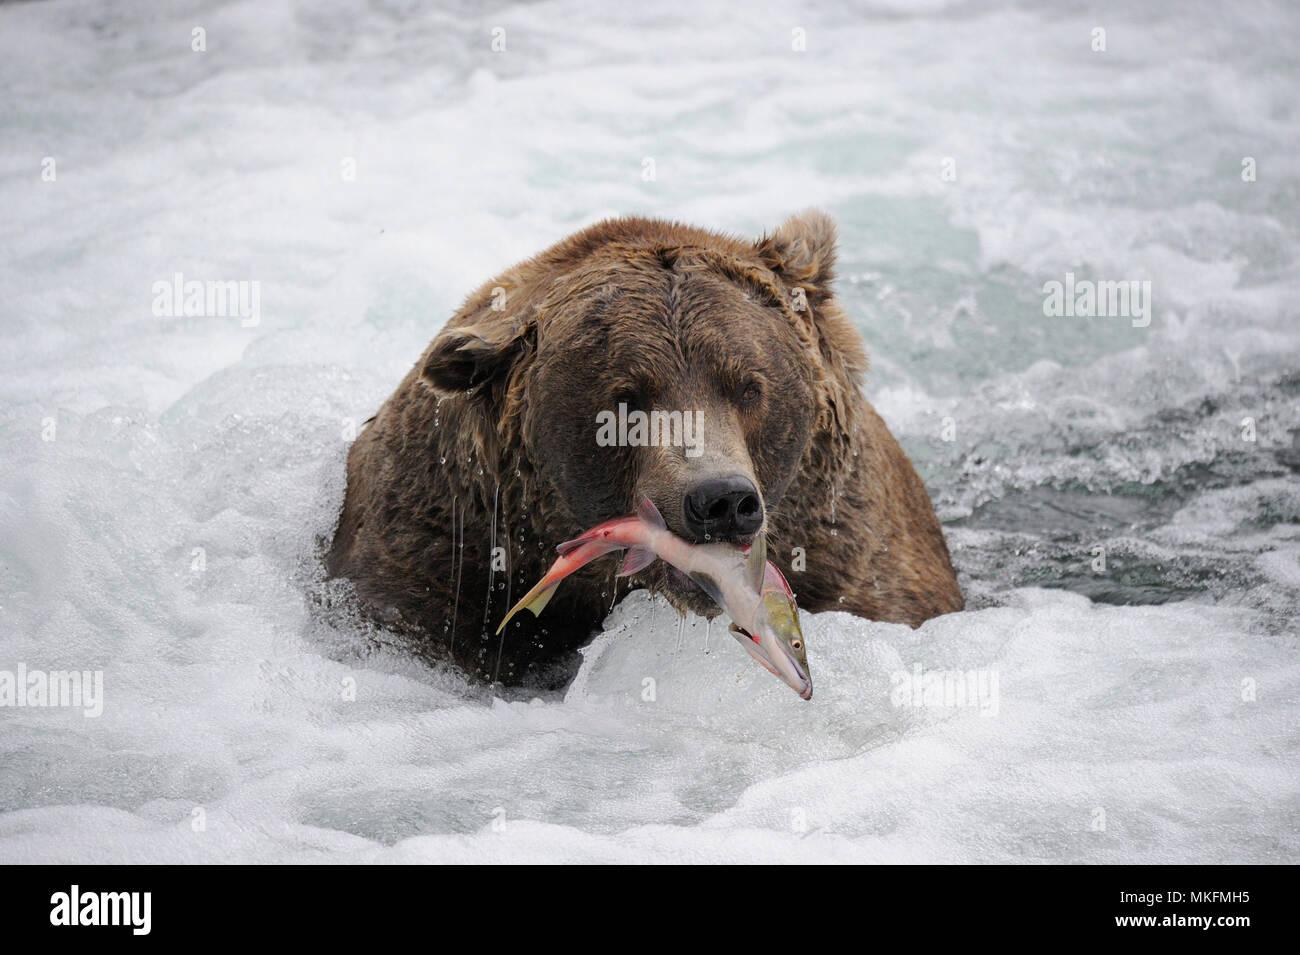 Grizzly (Ursus arctos horribilis) fishing in water, Katmai National park, Alaska USA Stock Photo